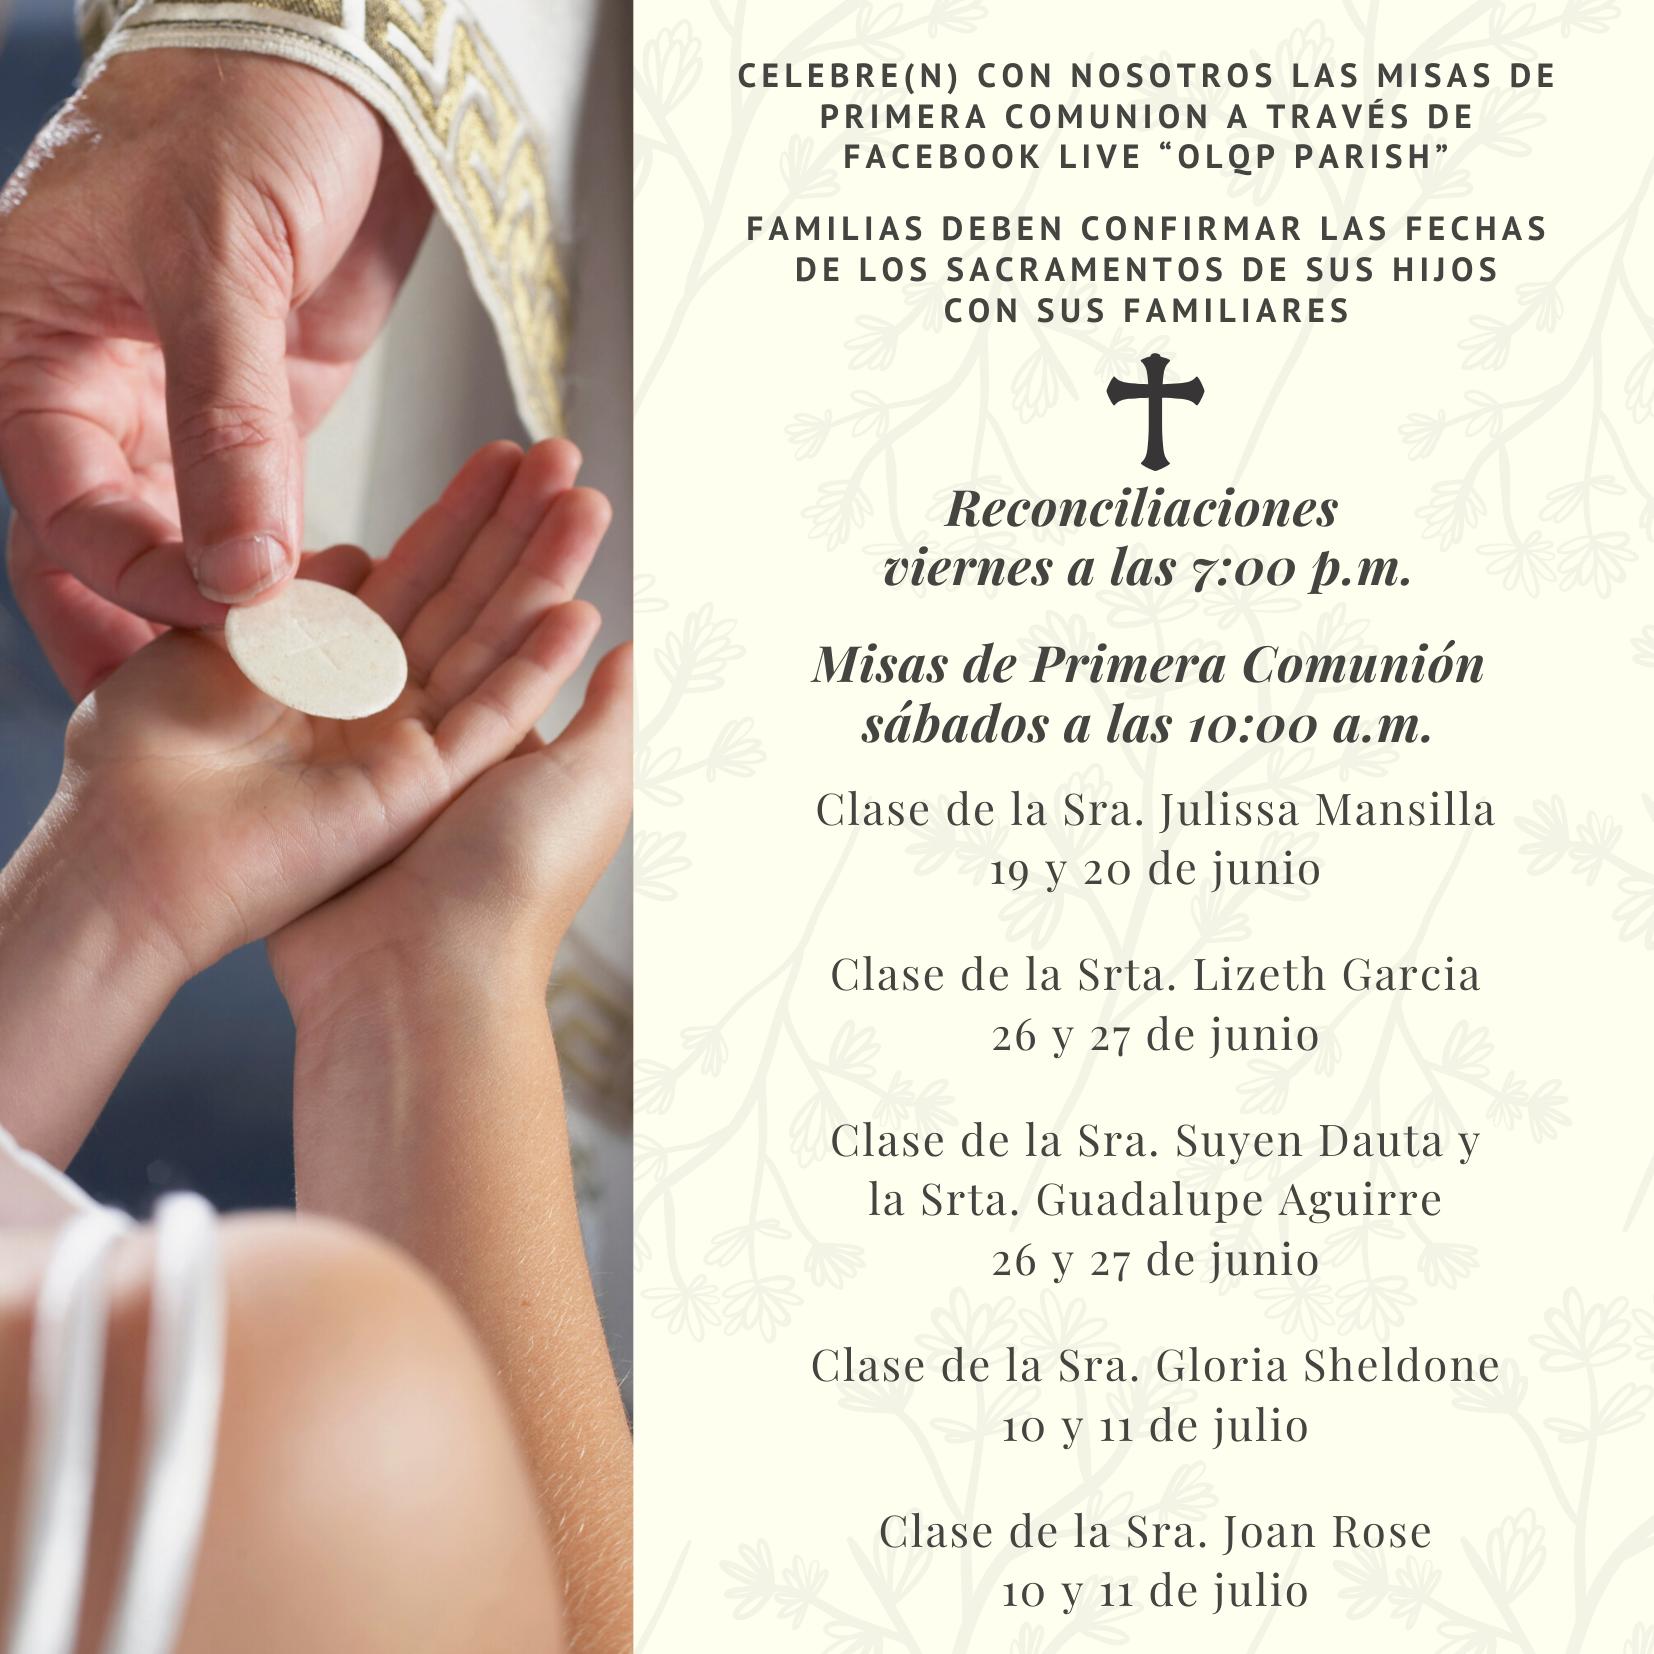 SPANISH SacramentAnnouncement (final)